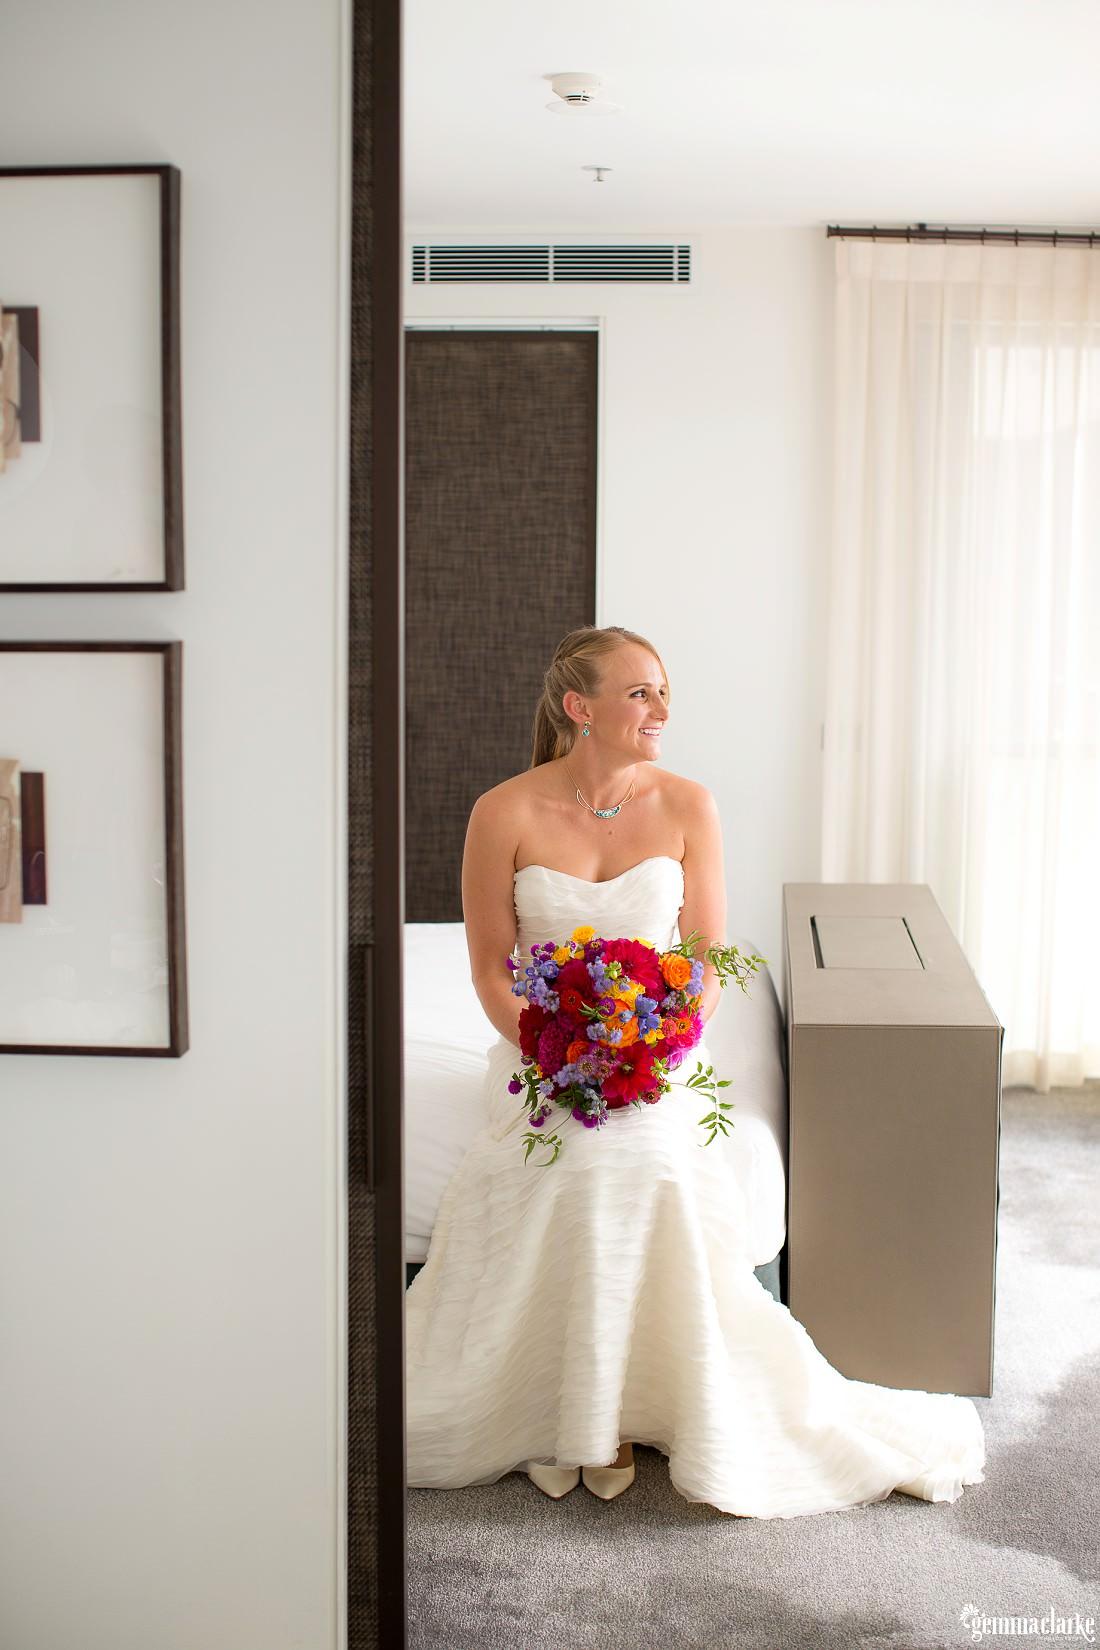 gemmaclarkephotography_cockatoo-island-wedding-photos_the-bar-at-the-end-of-the-wharf_0016